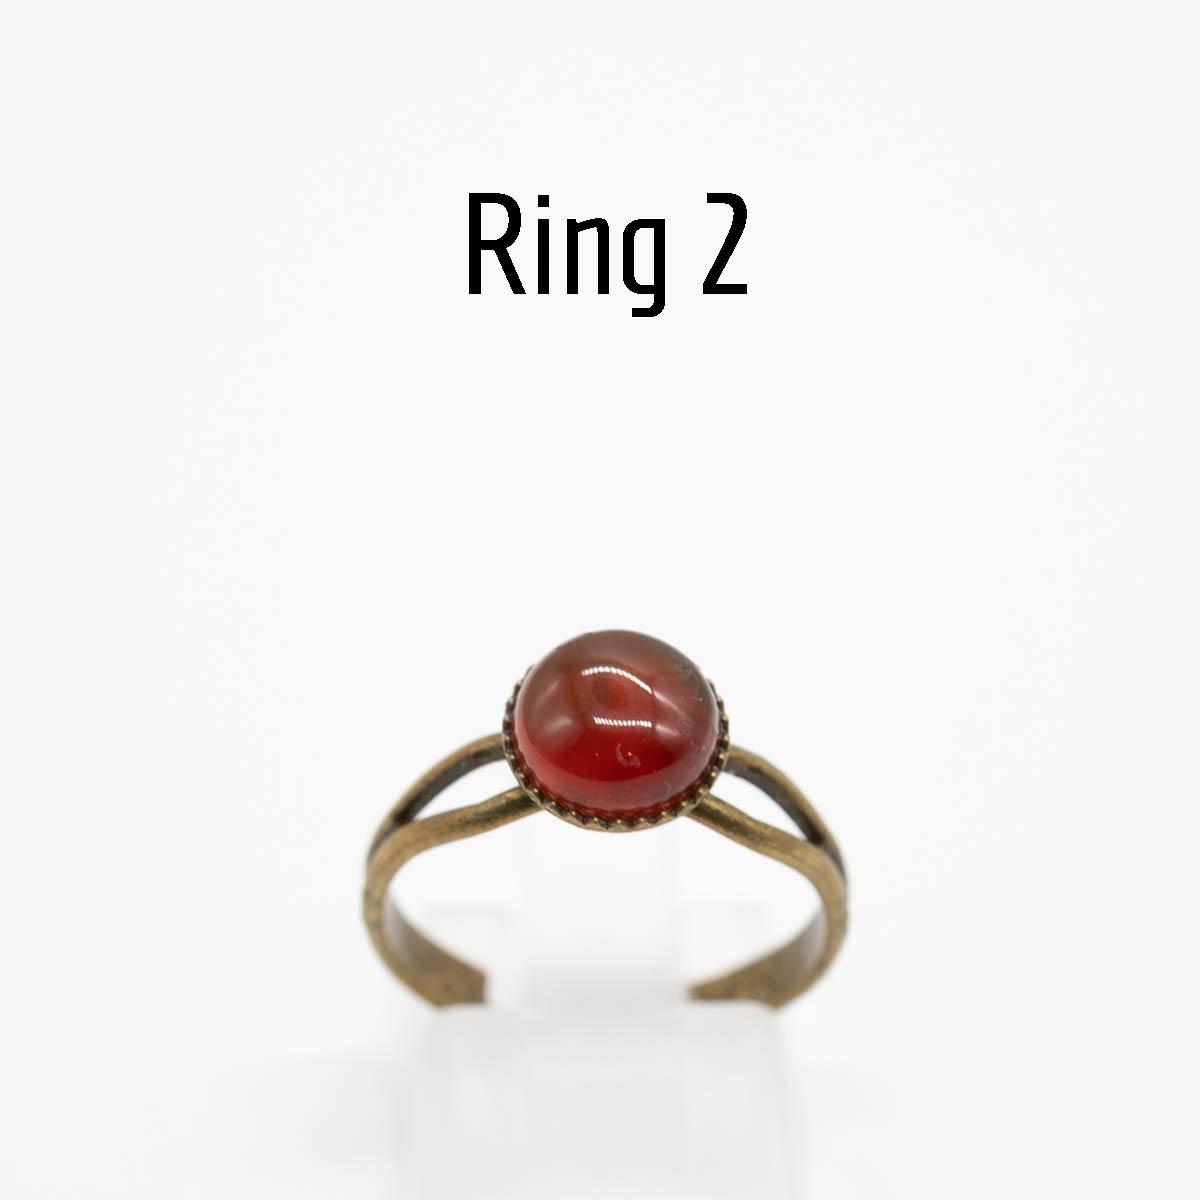 RNG-014 carneool ring kopen 2